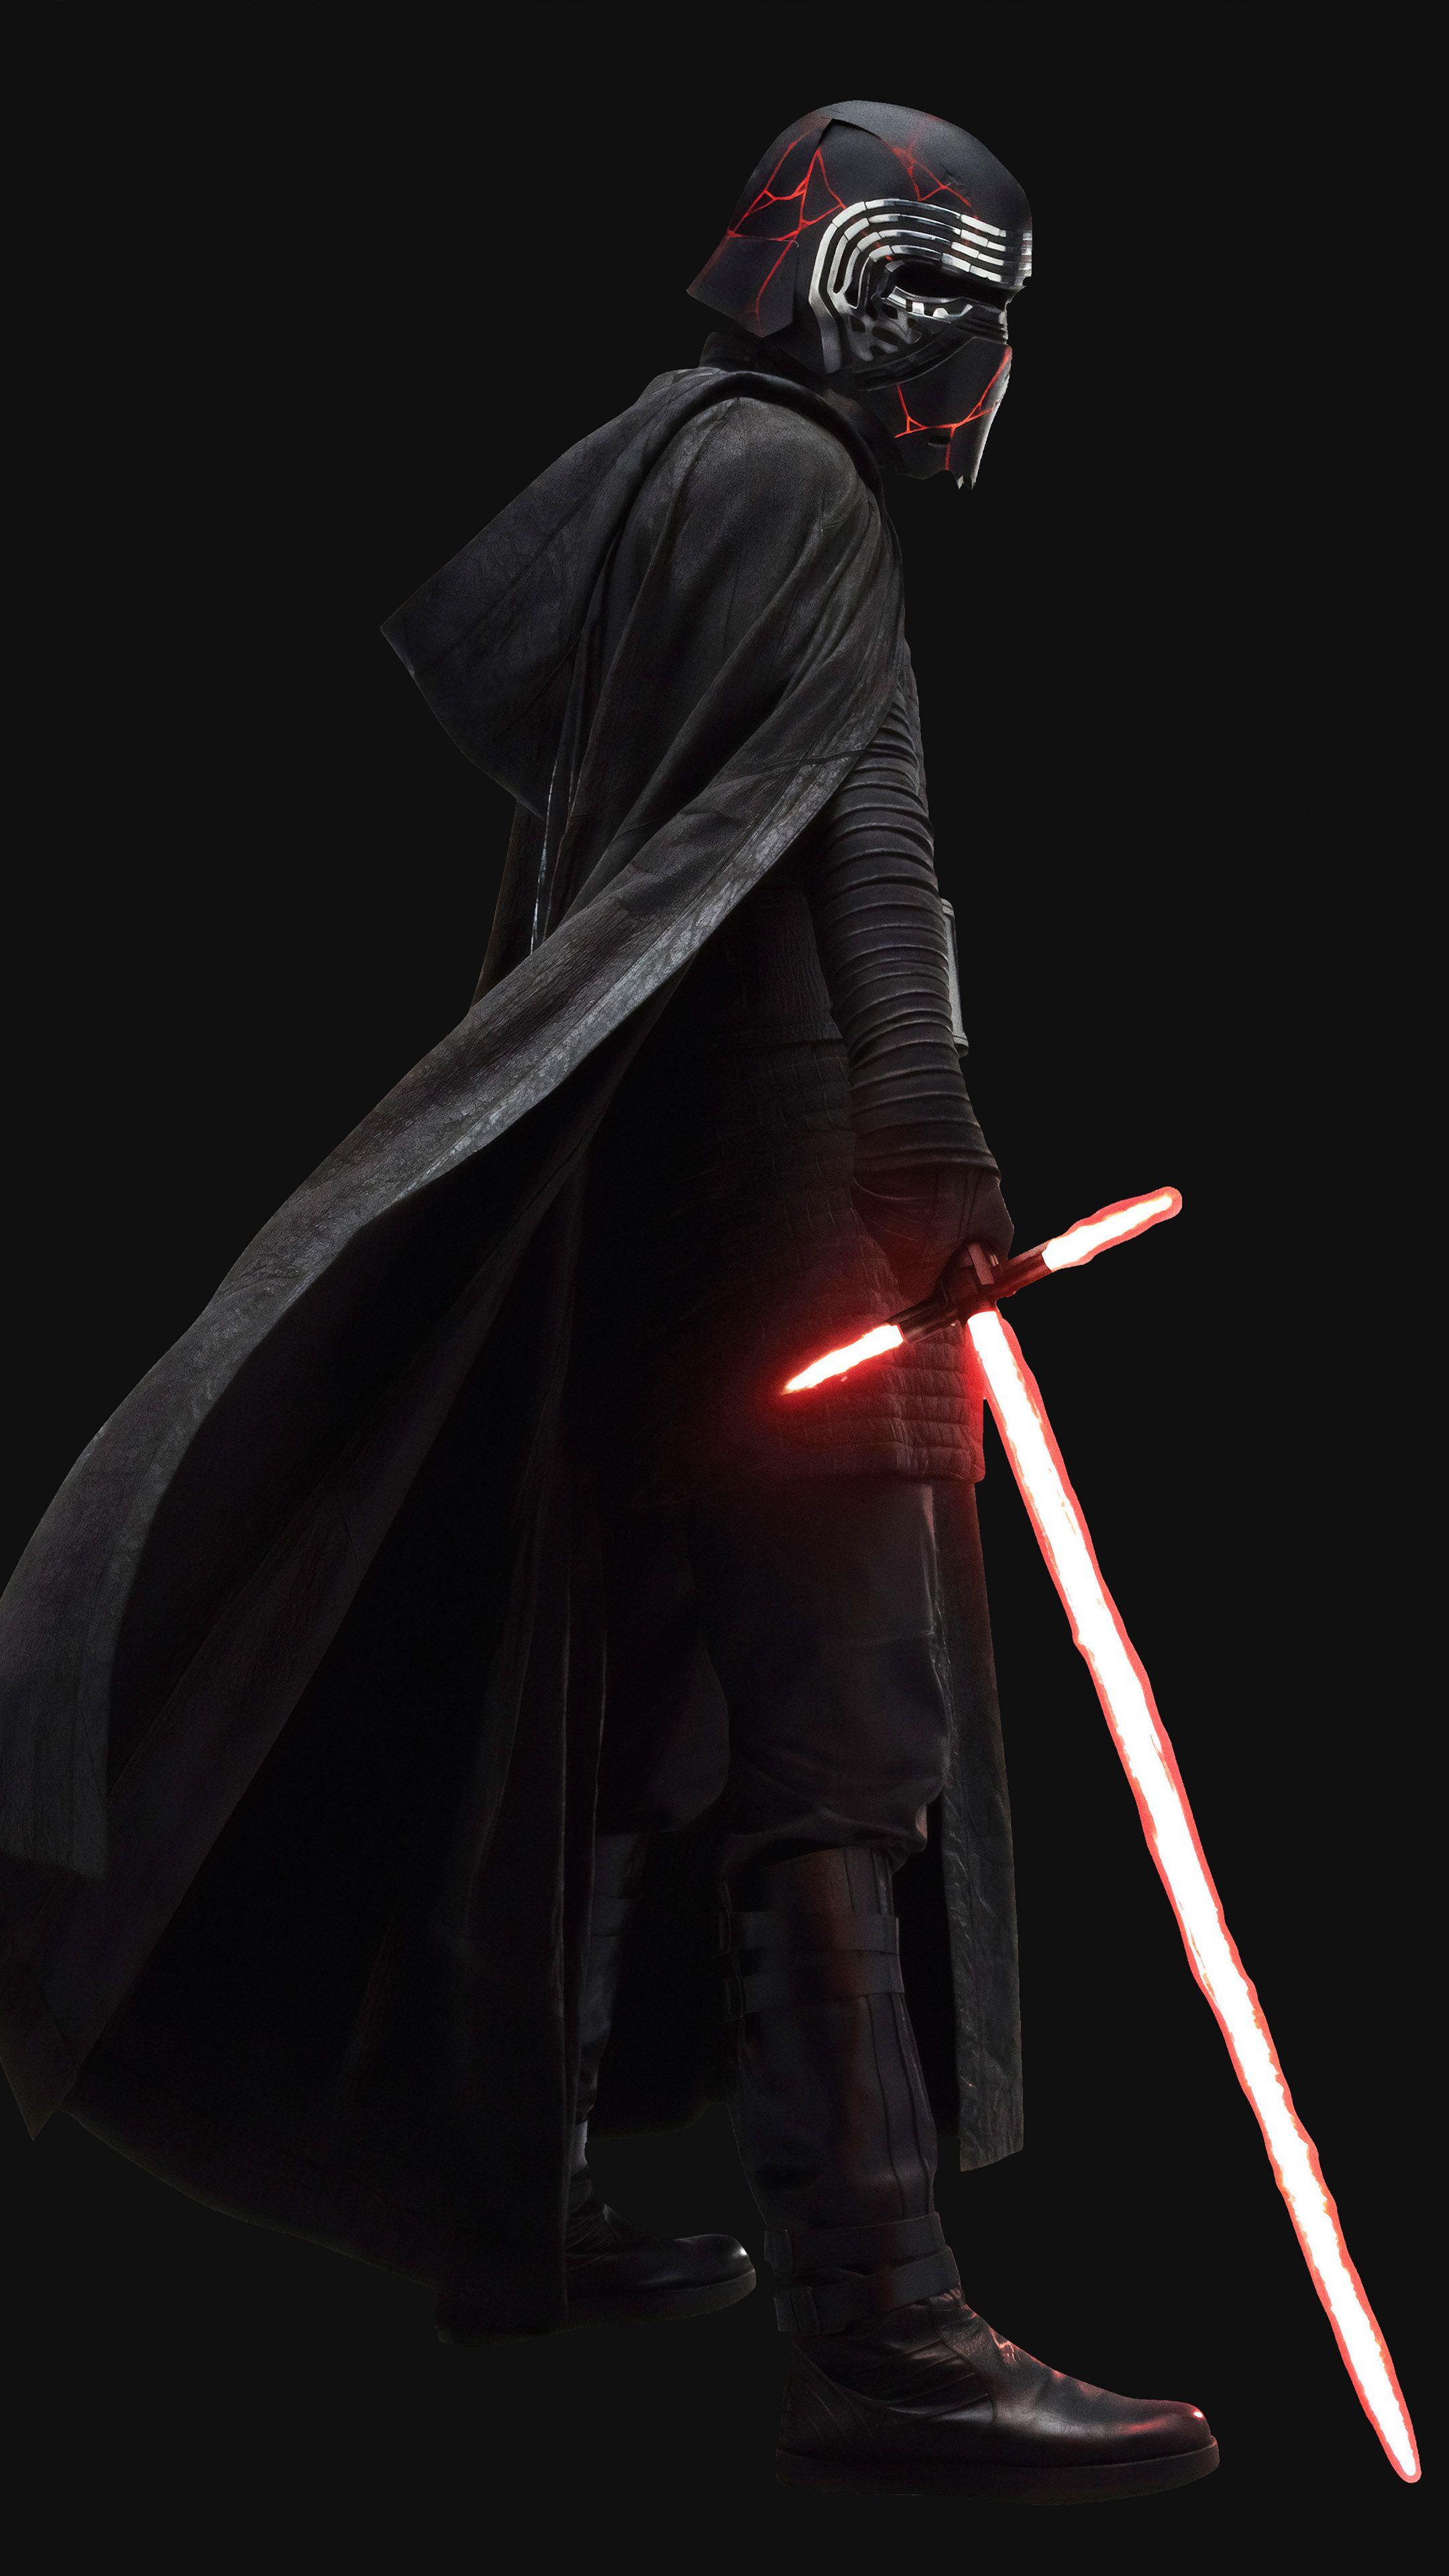 Kylo Ren Star Wars The Rise Of Skywalker Ren Star Wars Star Wars Background Star Wars Images